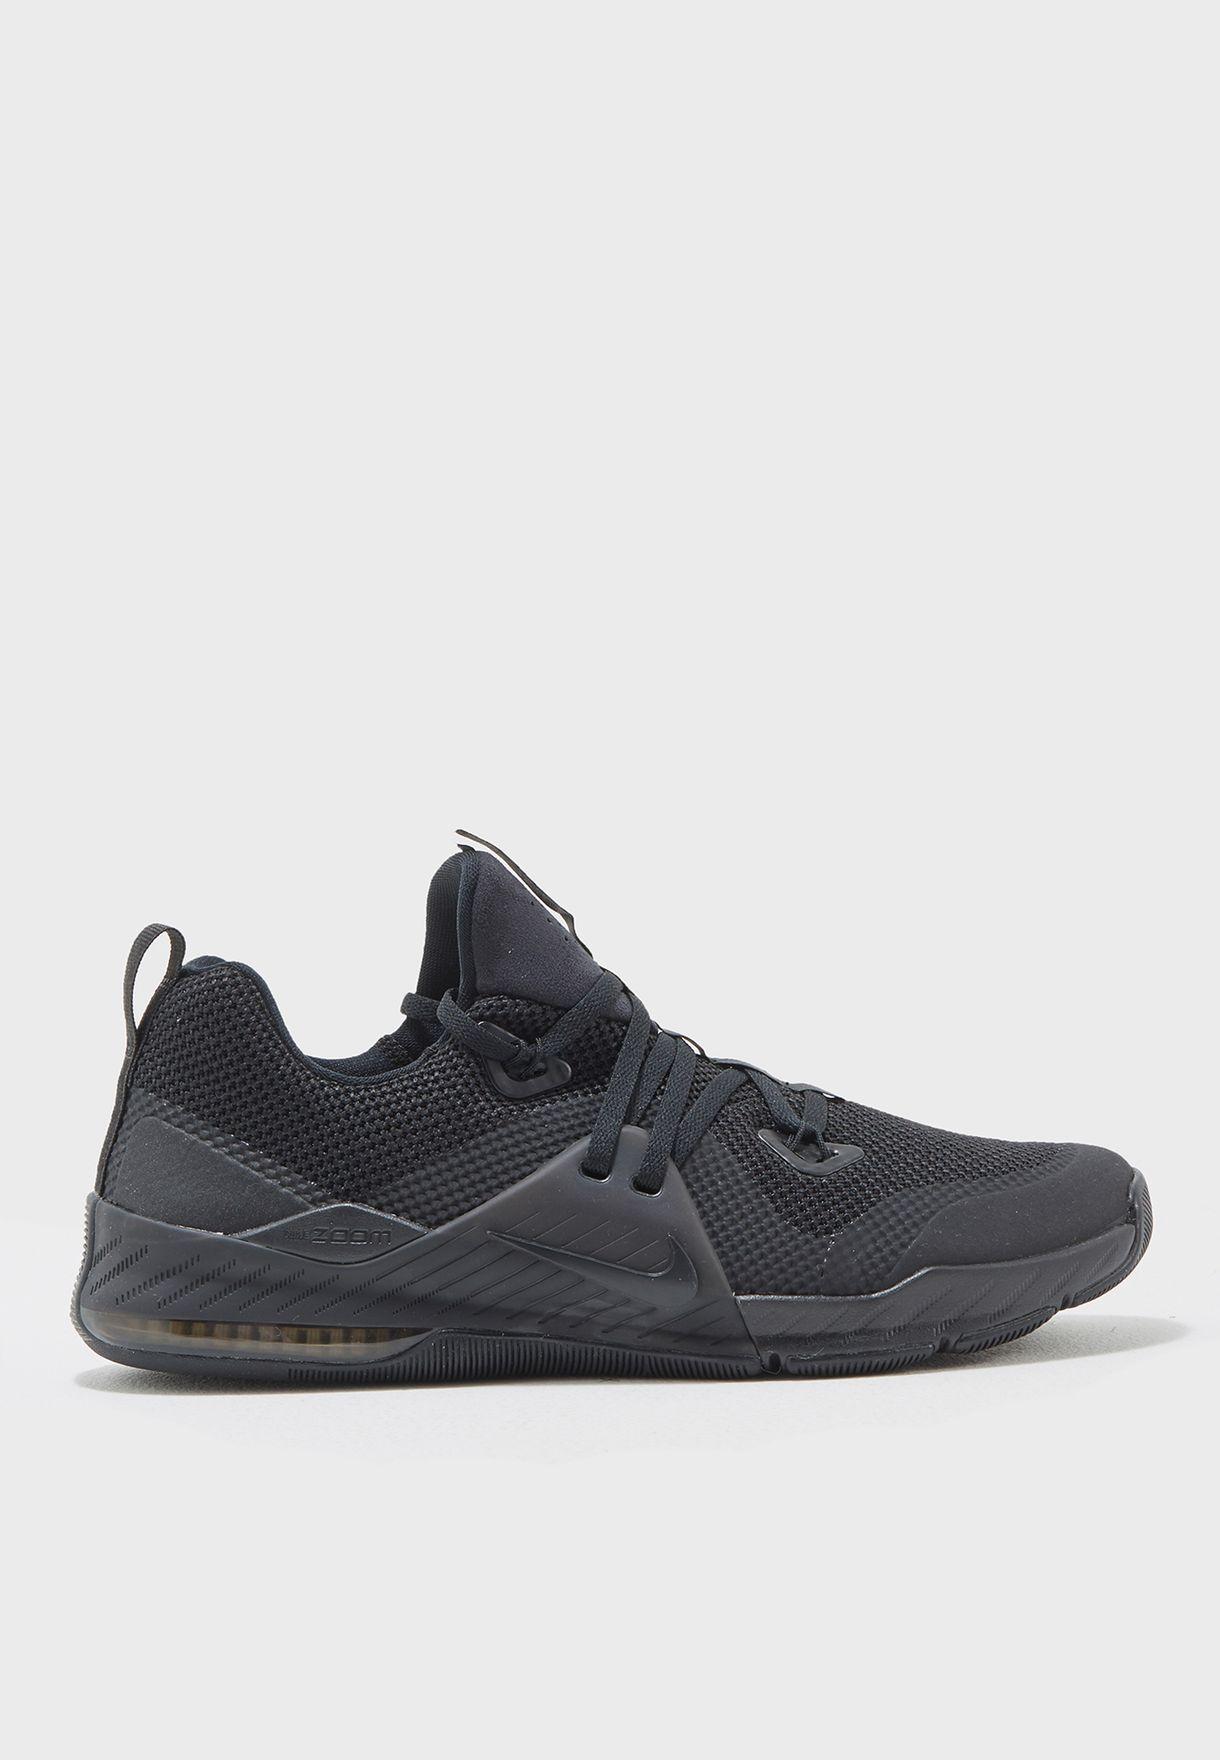 937b5ab19190 Shop Nike black Zoom Train Command 922478-004 for Men in UAE ...